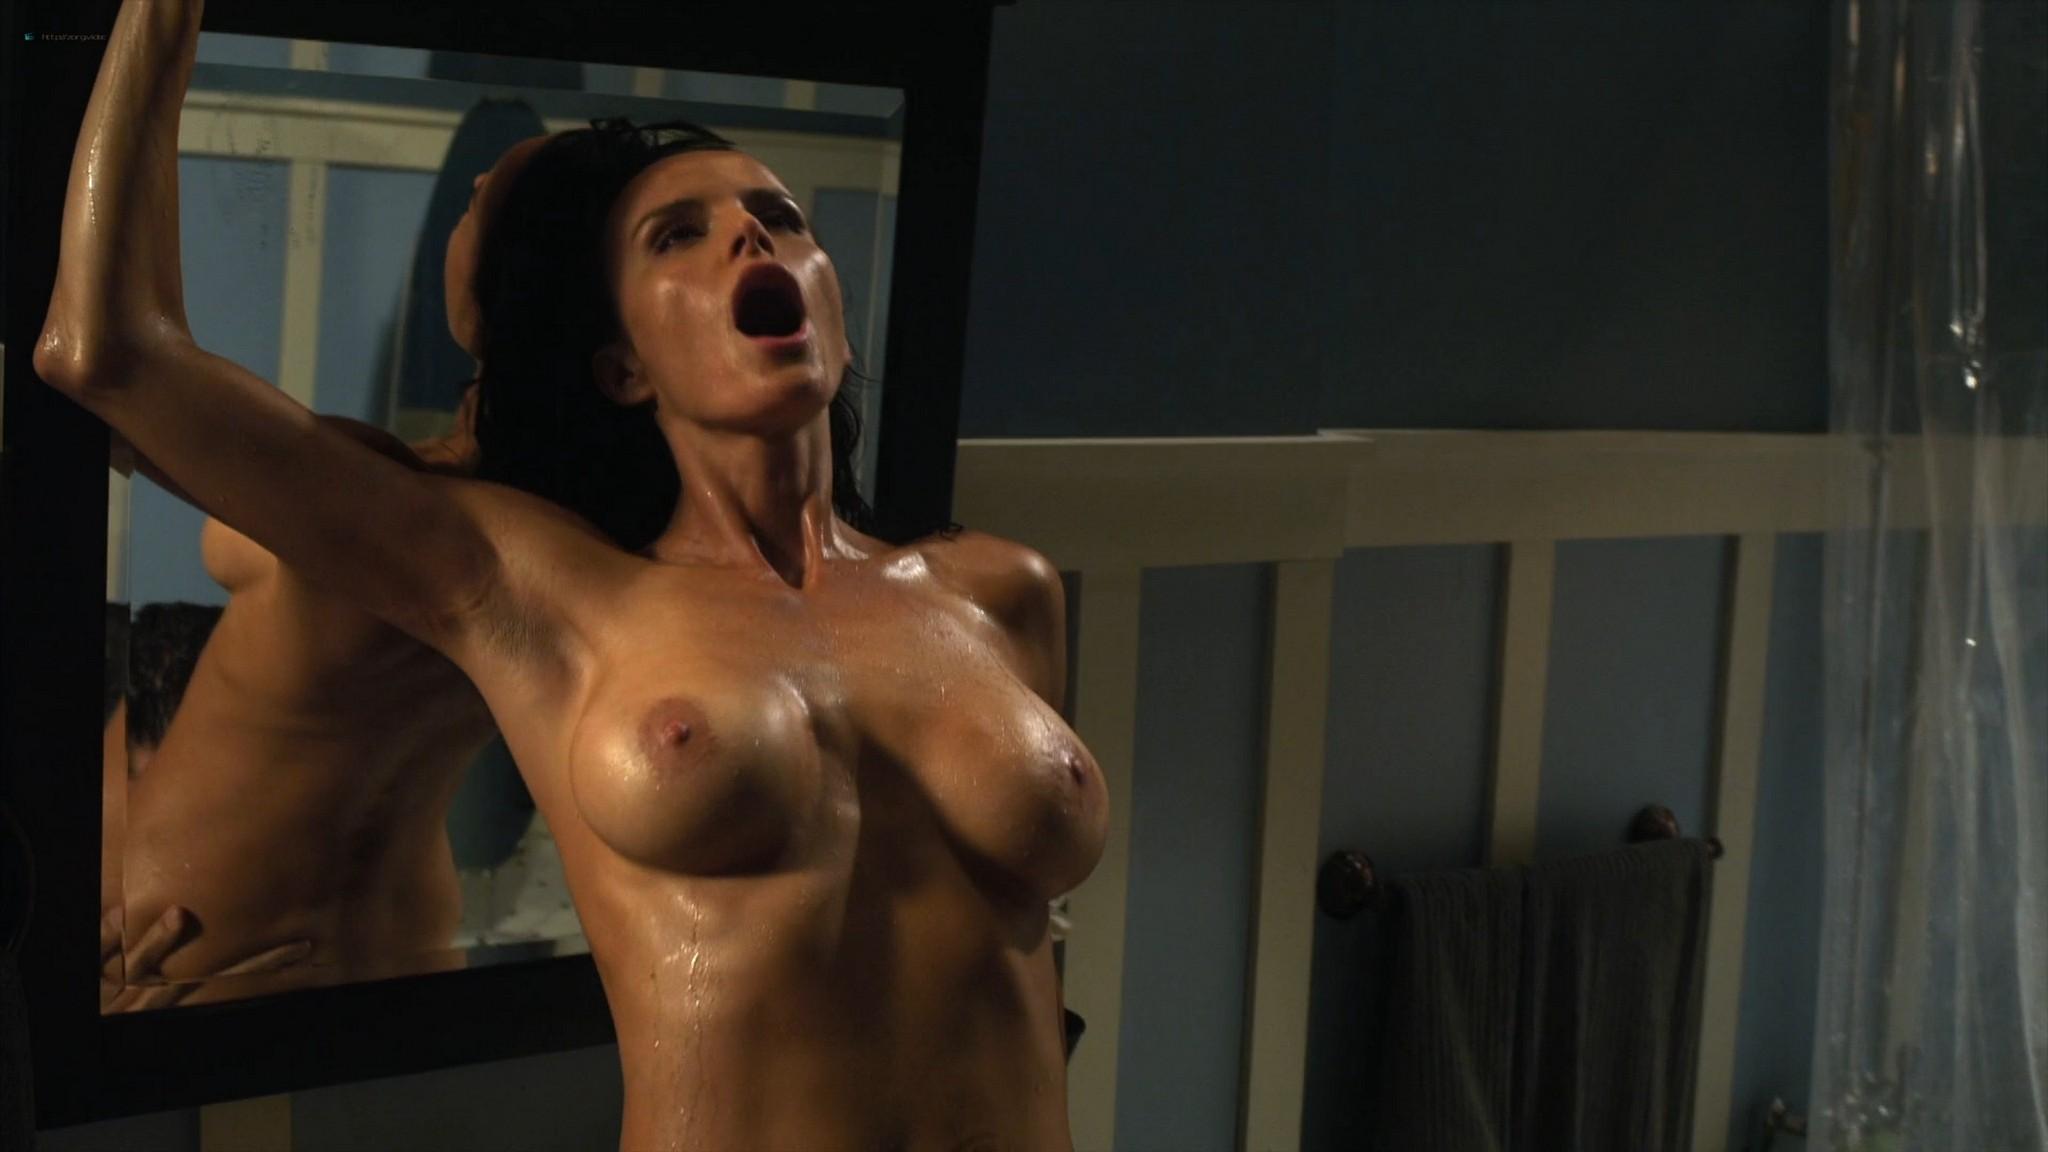 Ana Alexander nude sex Antonia Raftu sexy - Chemistry (2011) s1e10 HD 1080p (6)